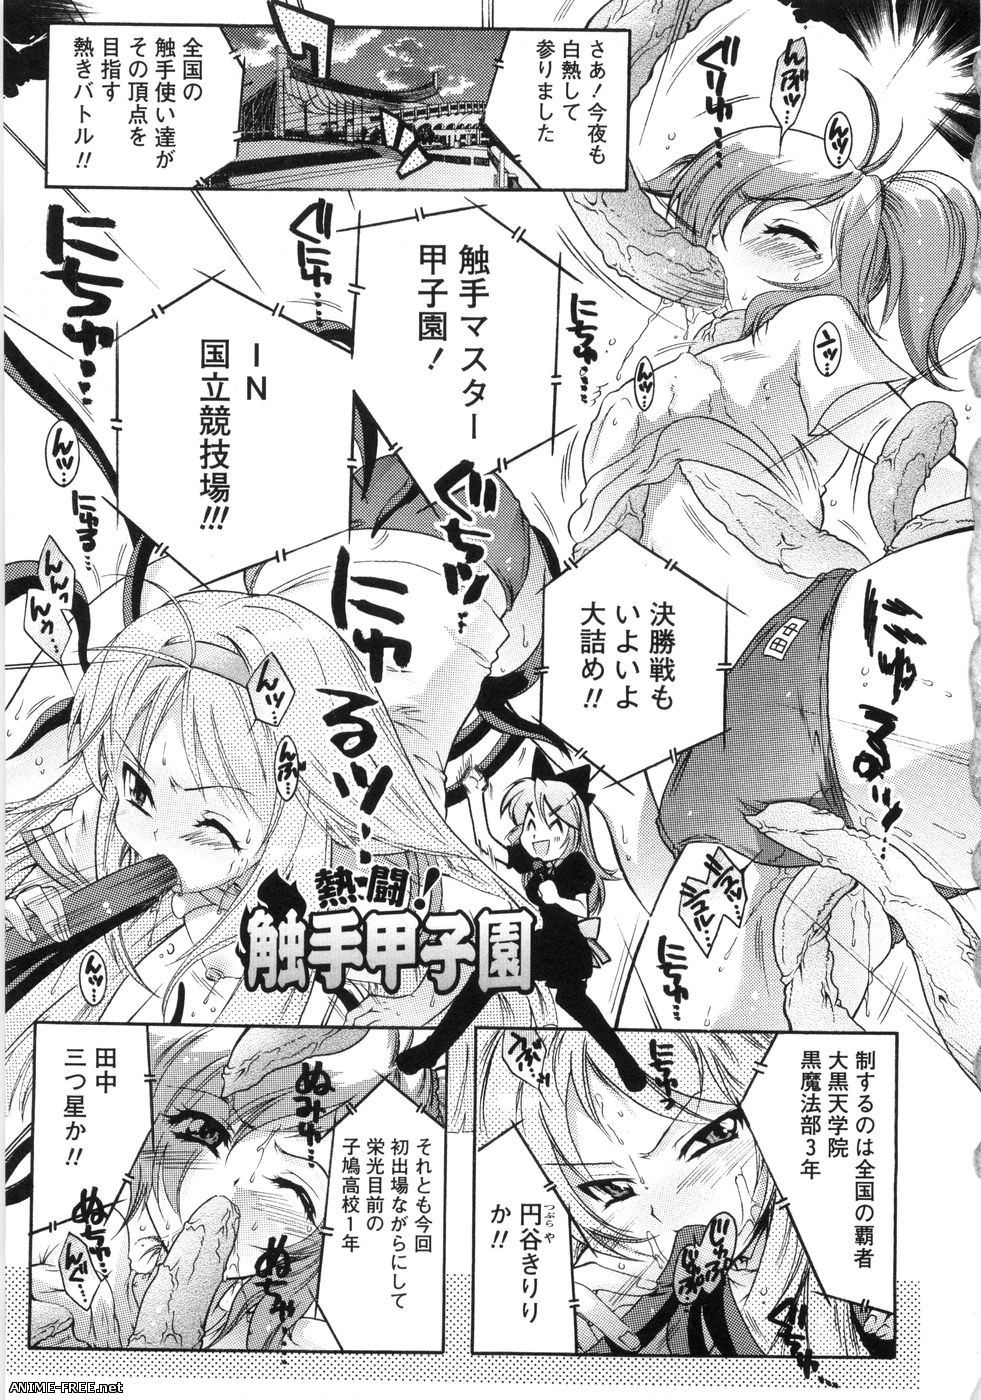 Honda Arima / Honda Koumuten - ������� ������ ����� [Cen] [ENG,JAP] Manga Hentai